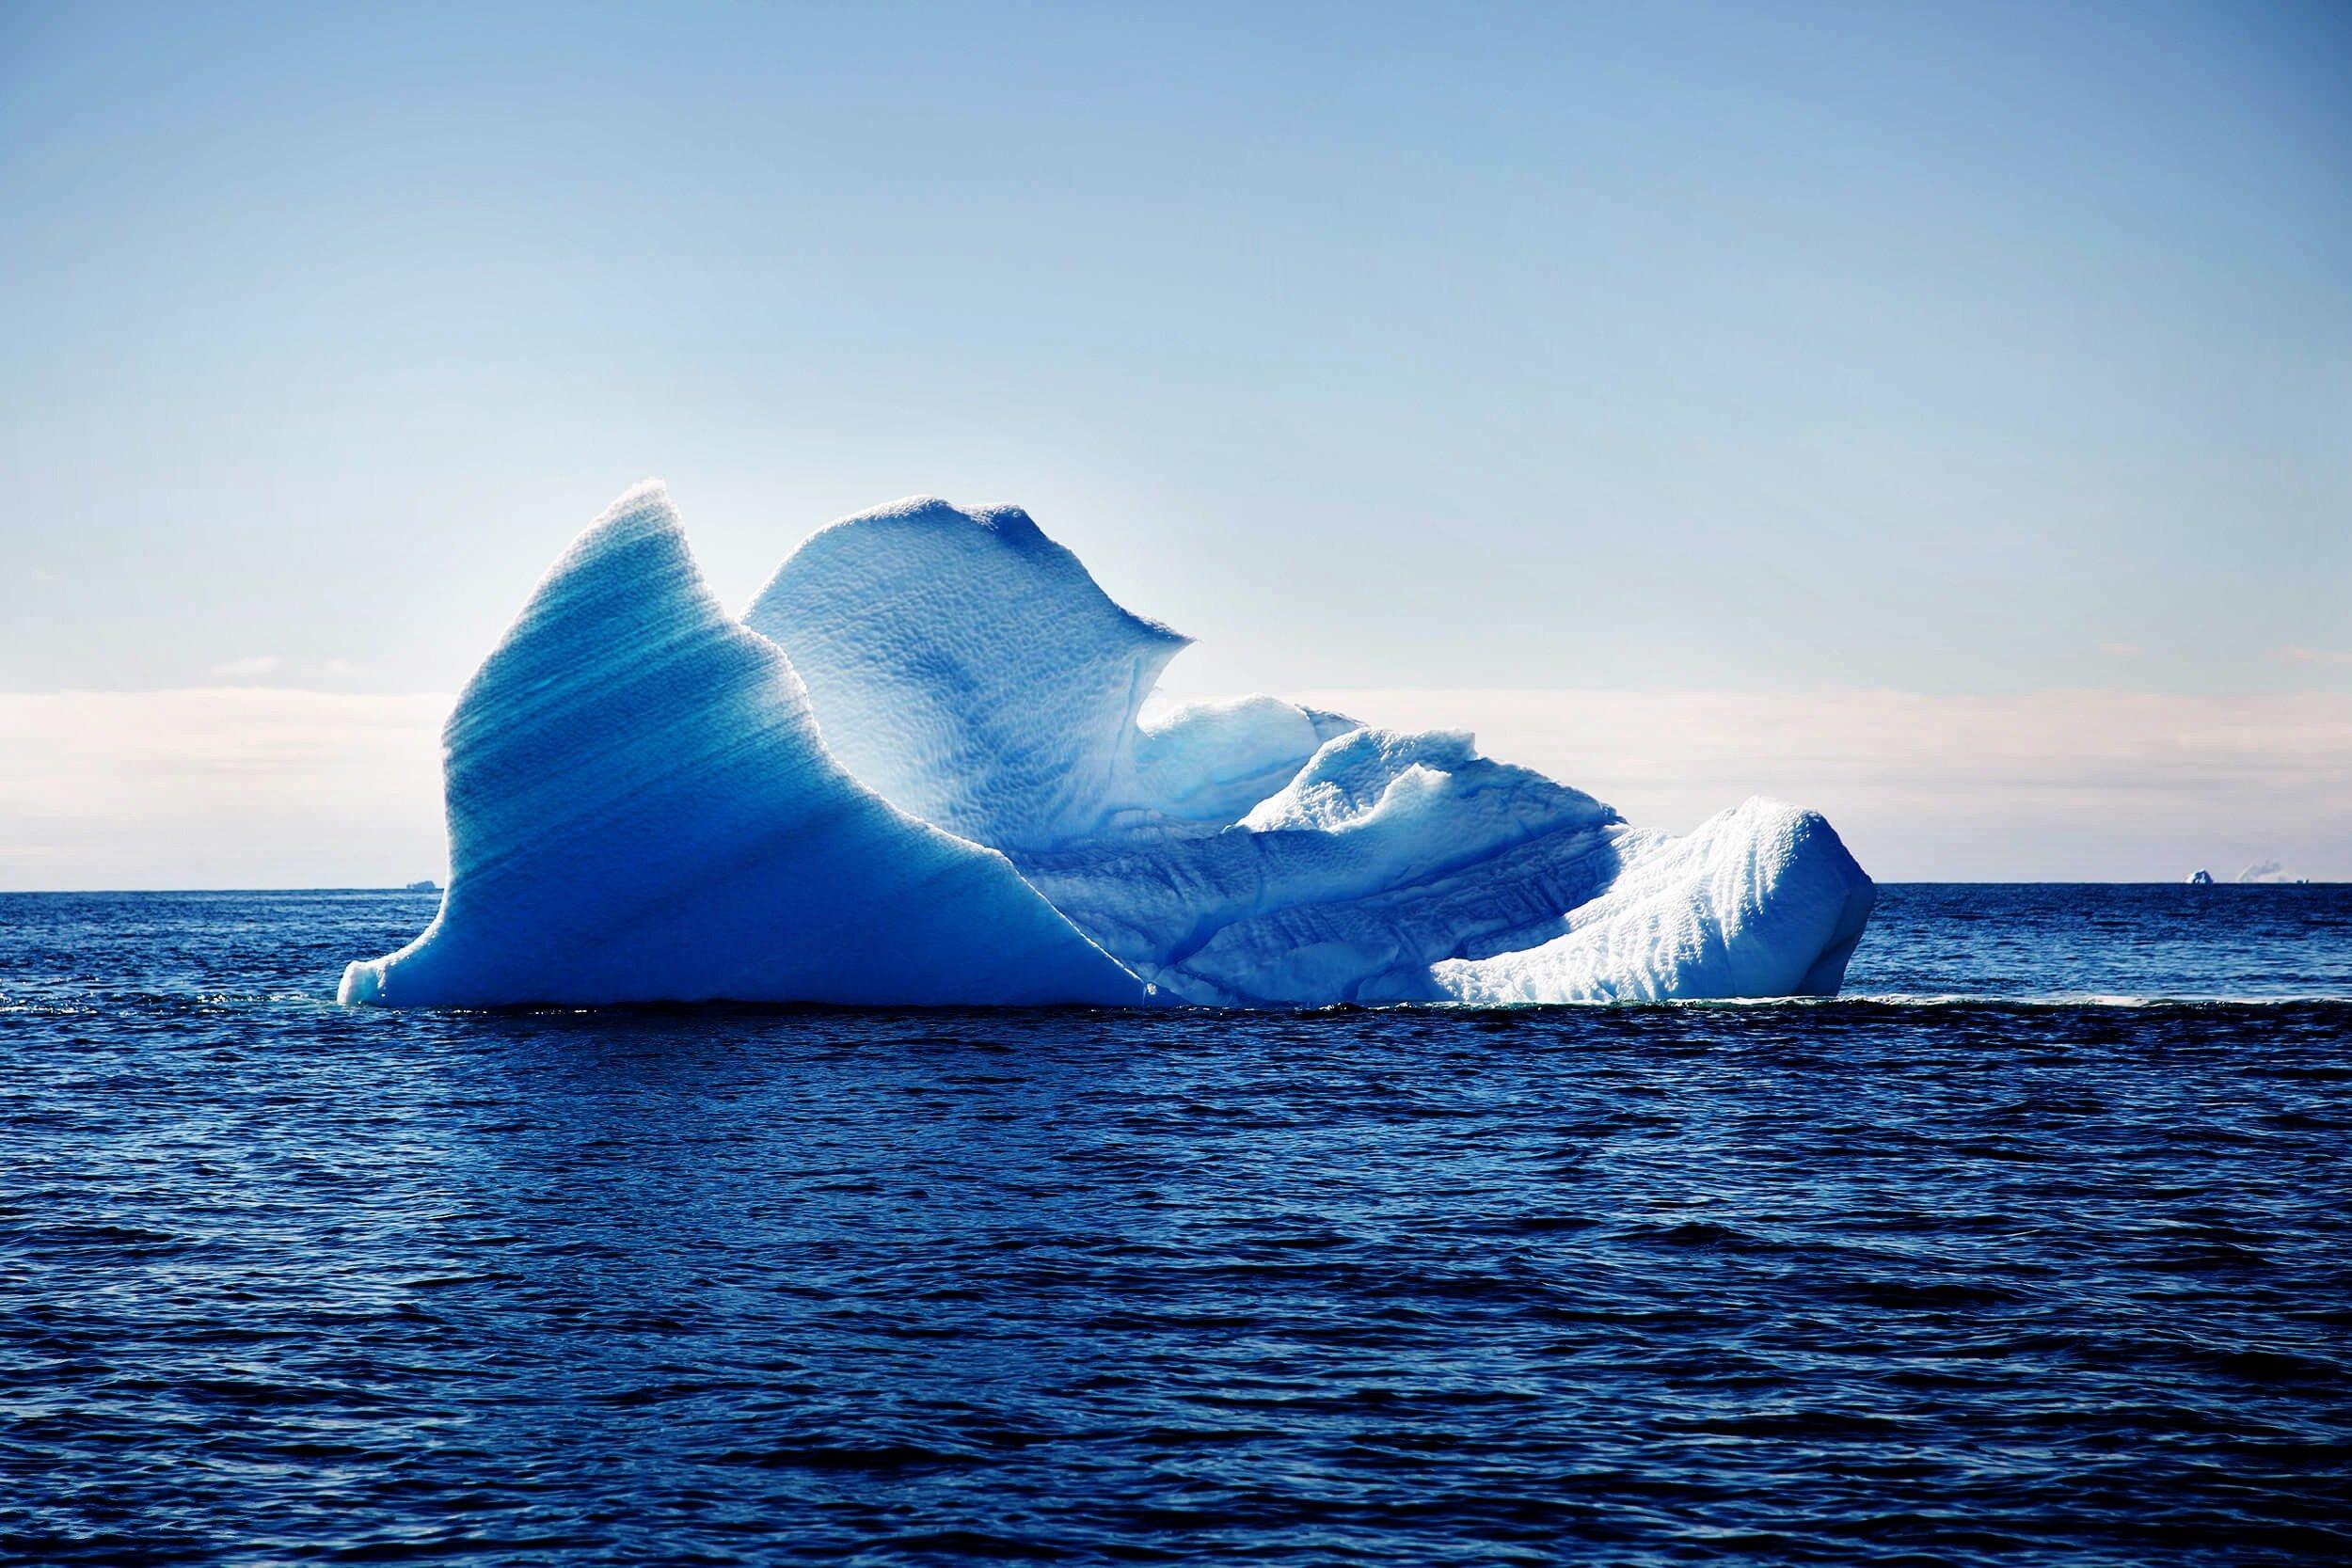 Iceberg 19 bs tinypng.jpg